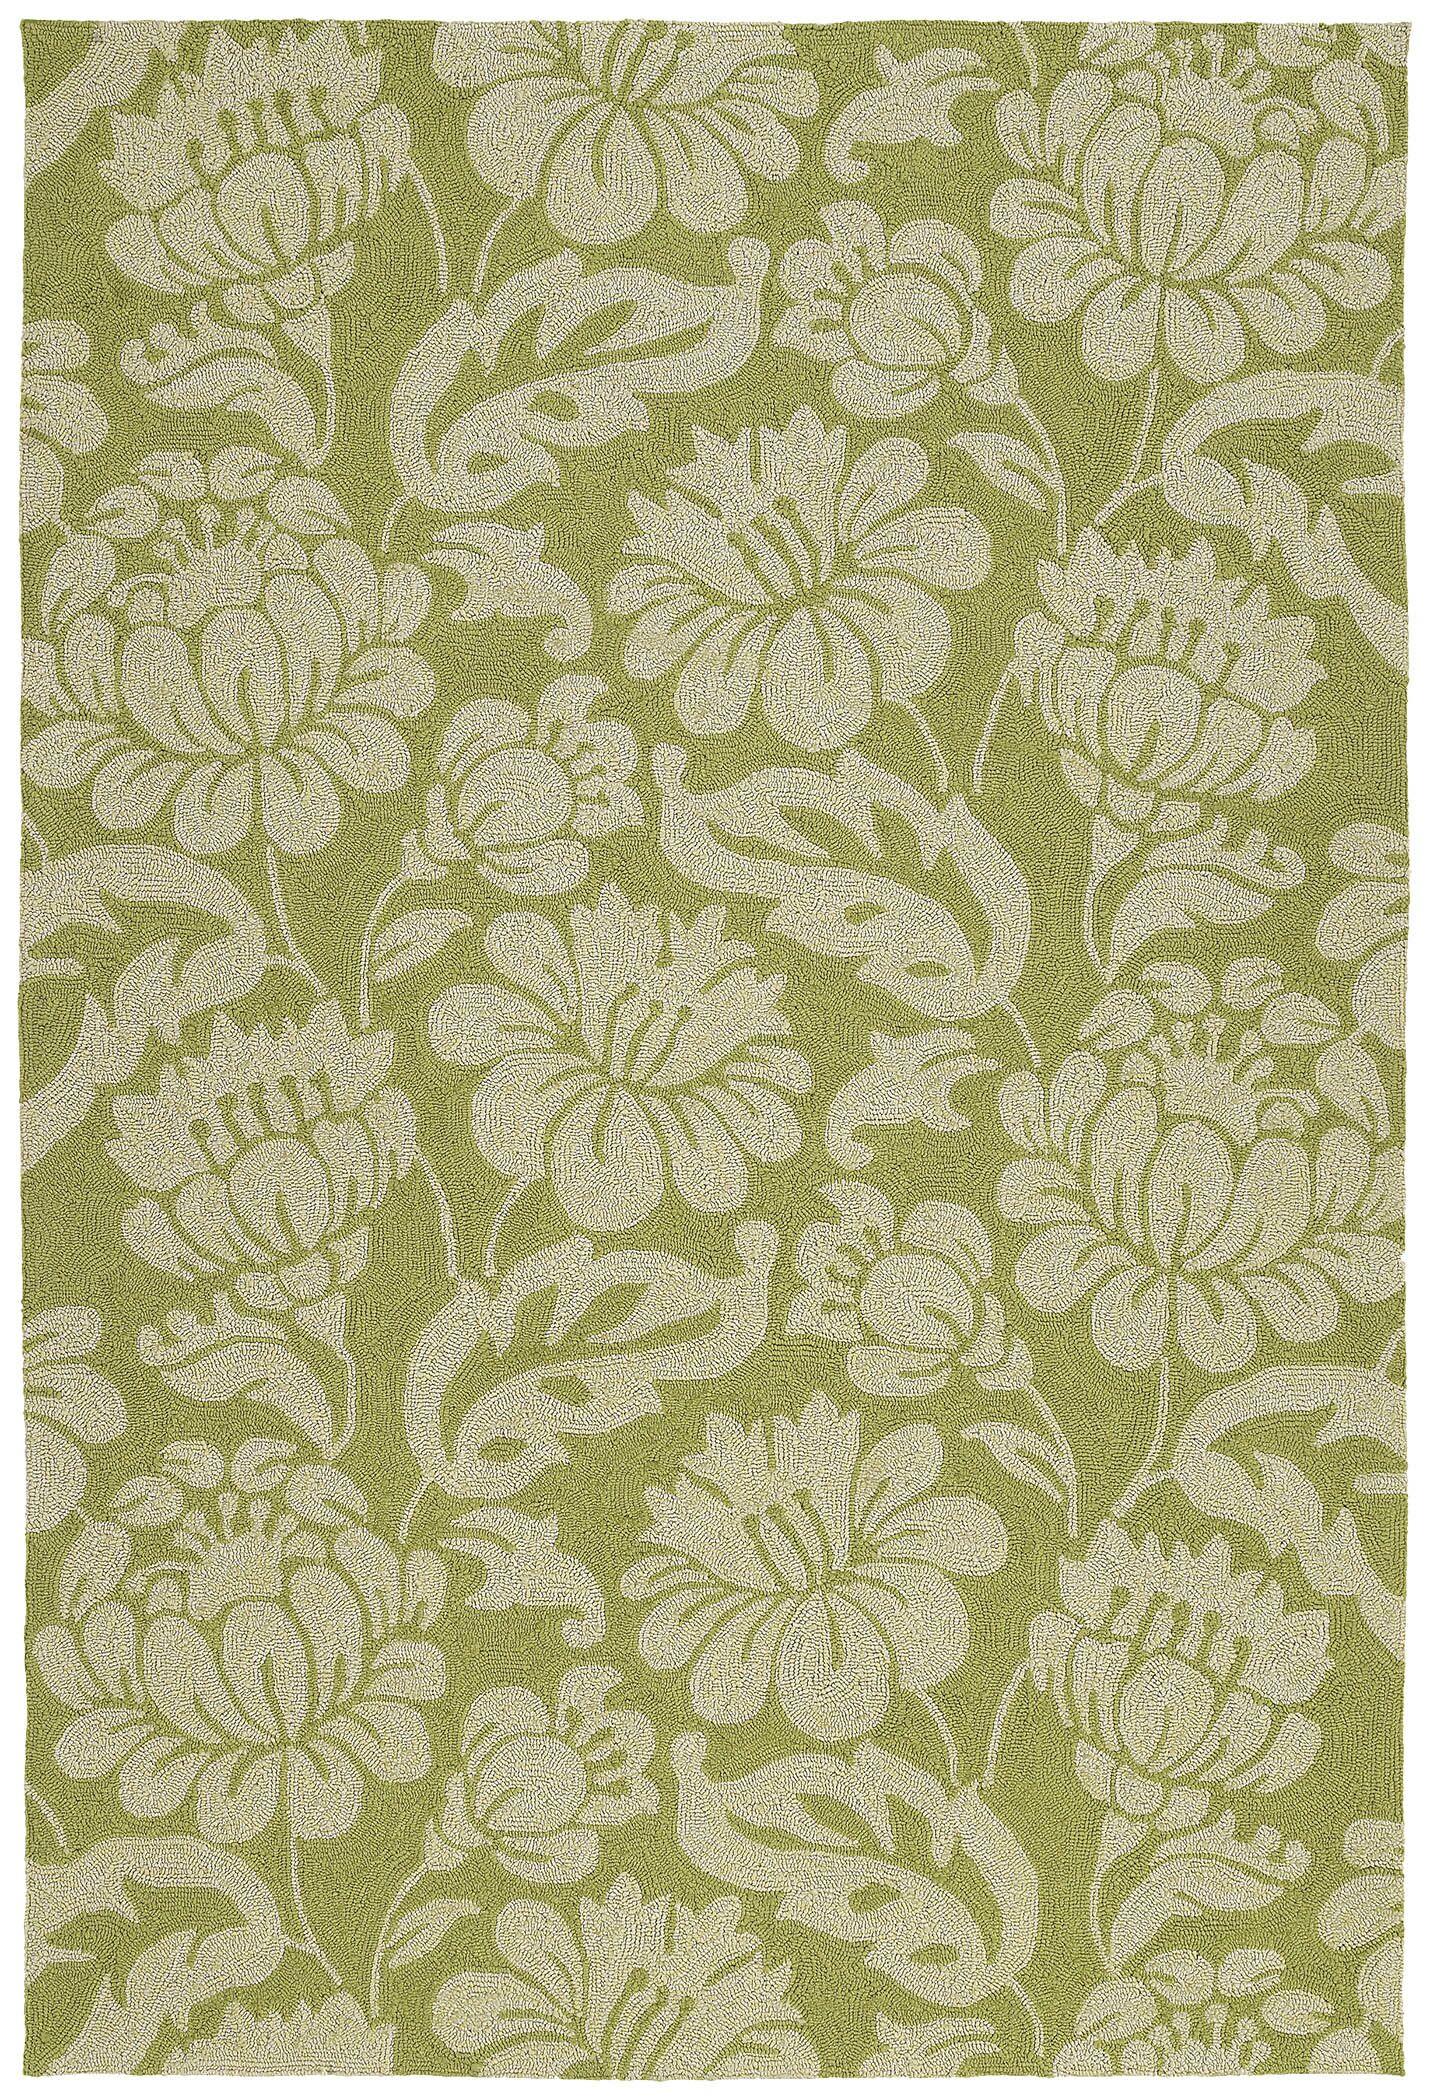 Glenn Wasabi Floral Indoor/Outdoor Area Rug Rug Size: Rectangle 8' x 10'